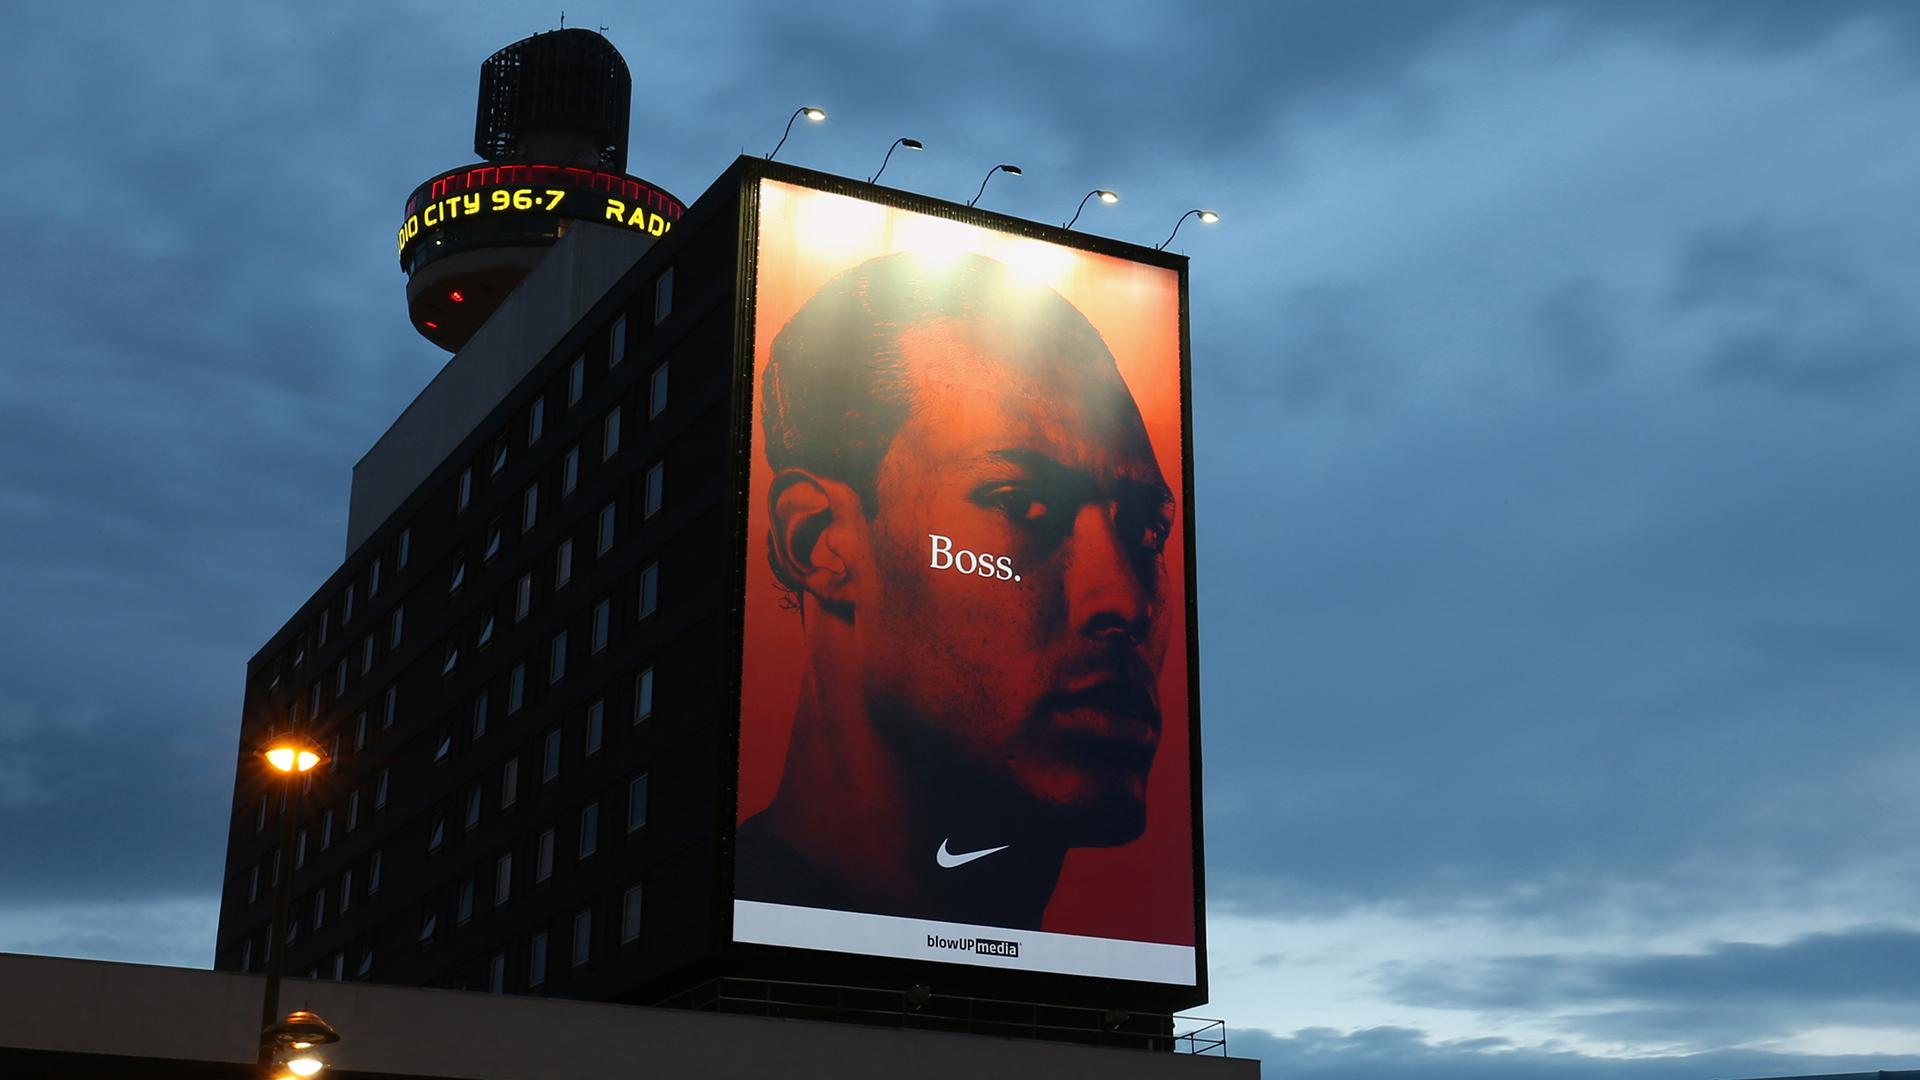 ooh-artwork-nike-billboard